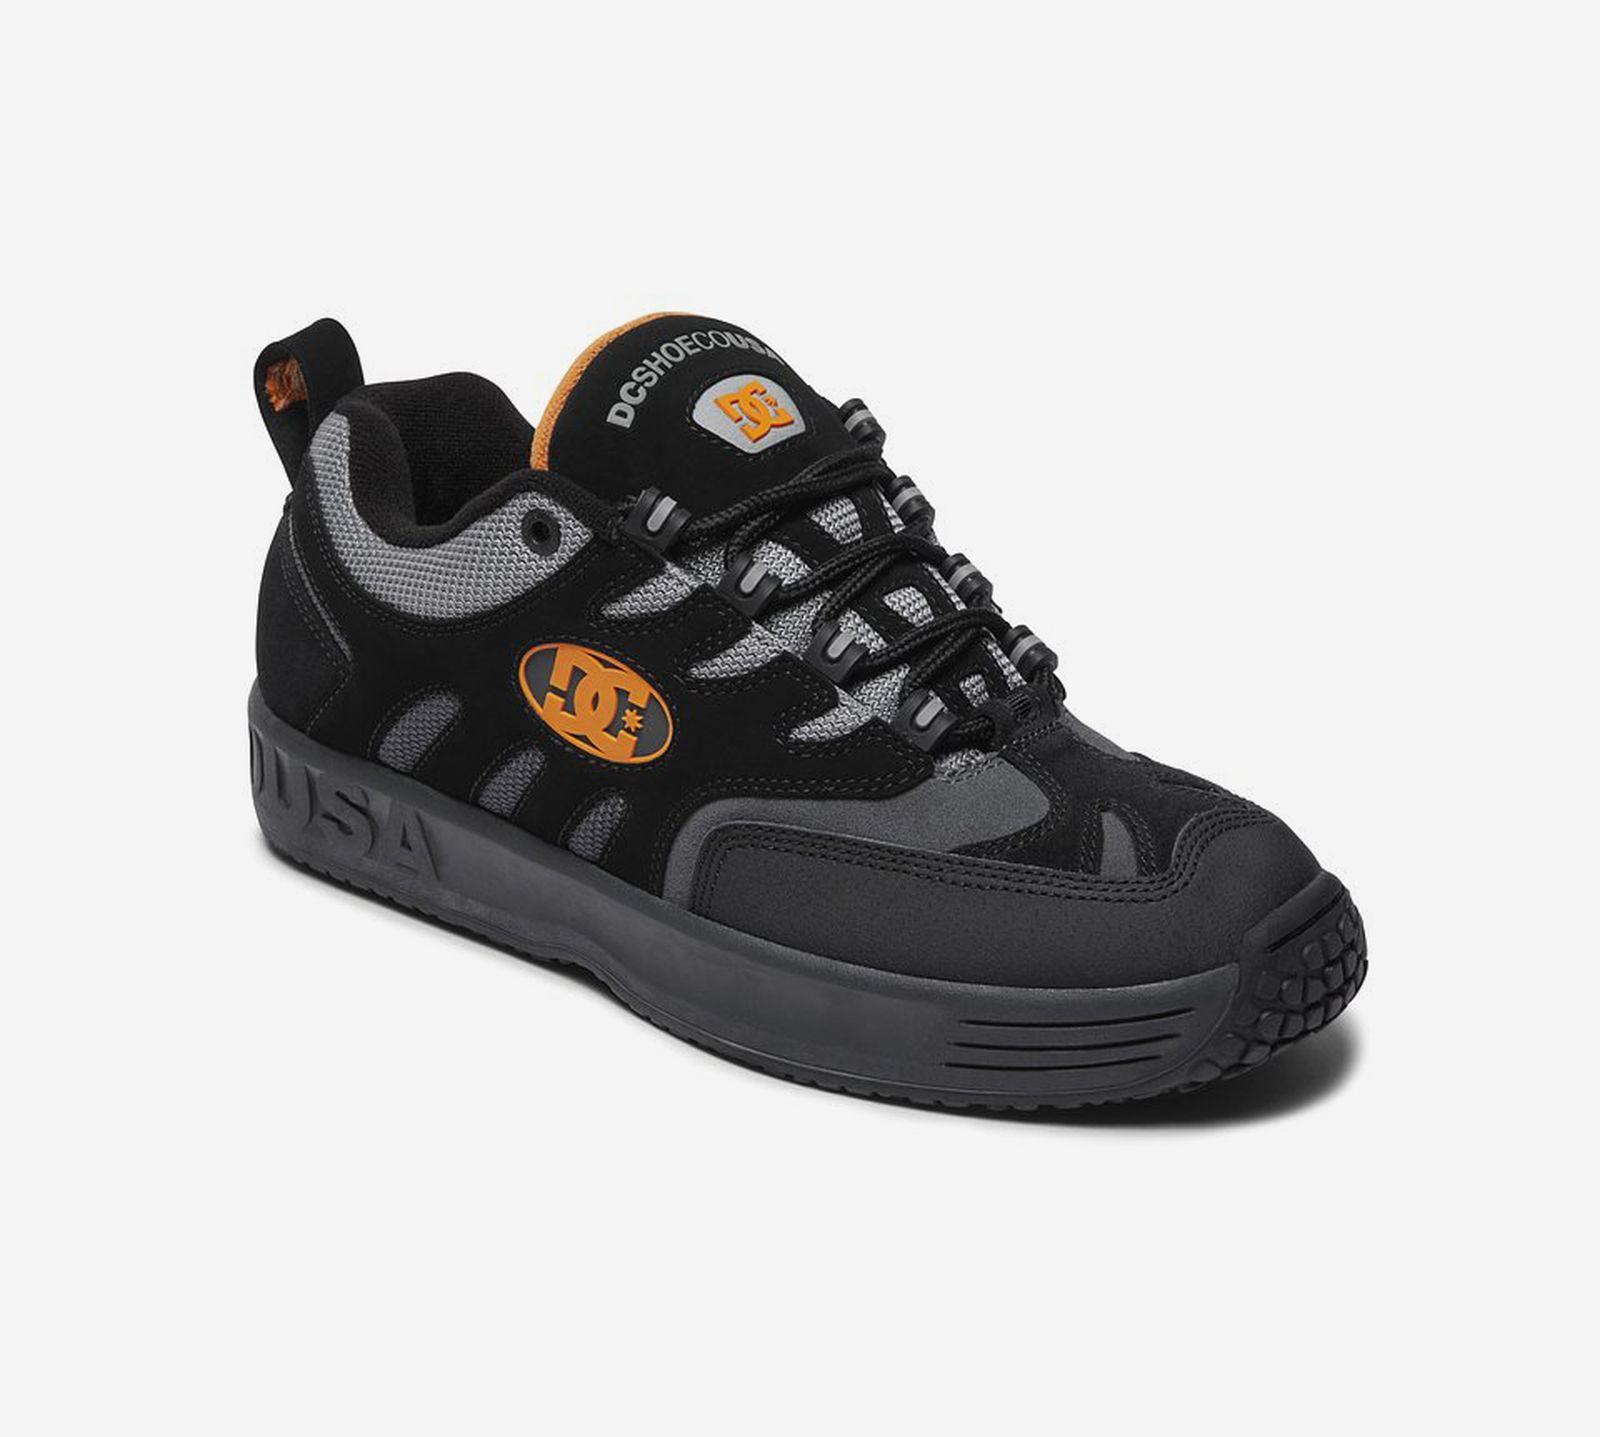 dc-shoes-lukoda-og-black-charcoal-release-date-price-01